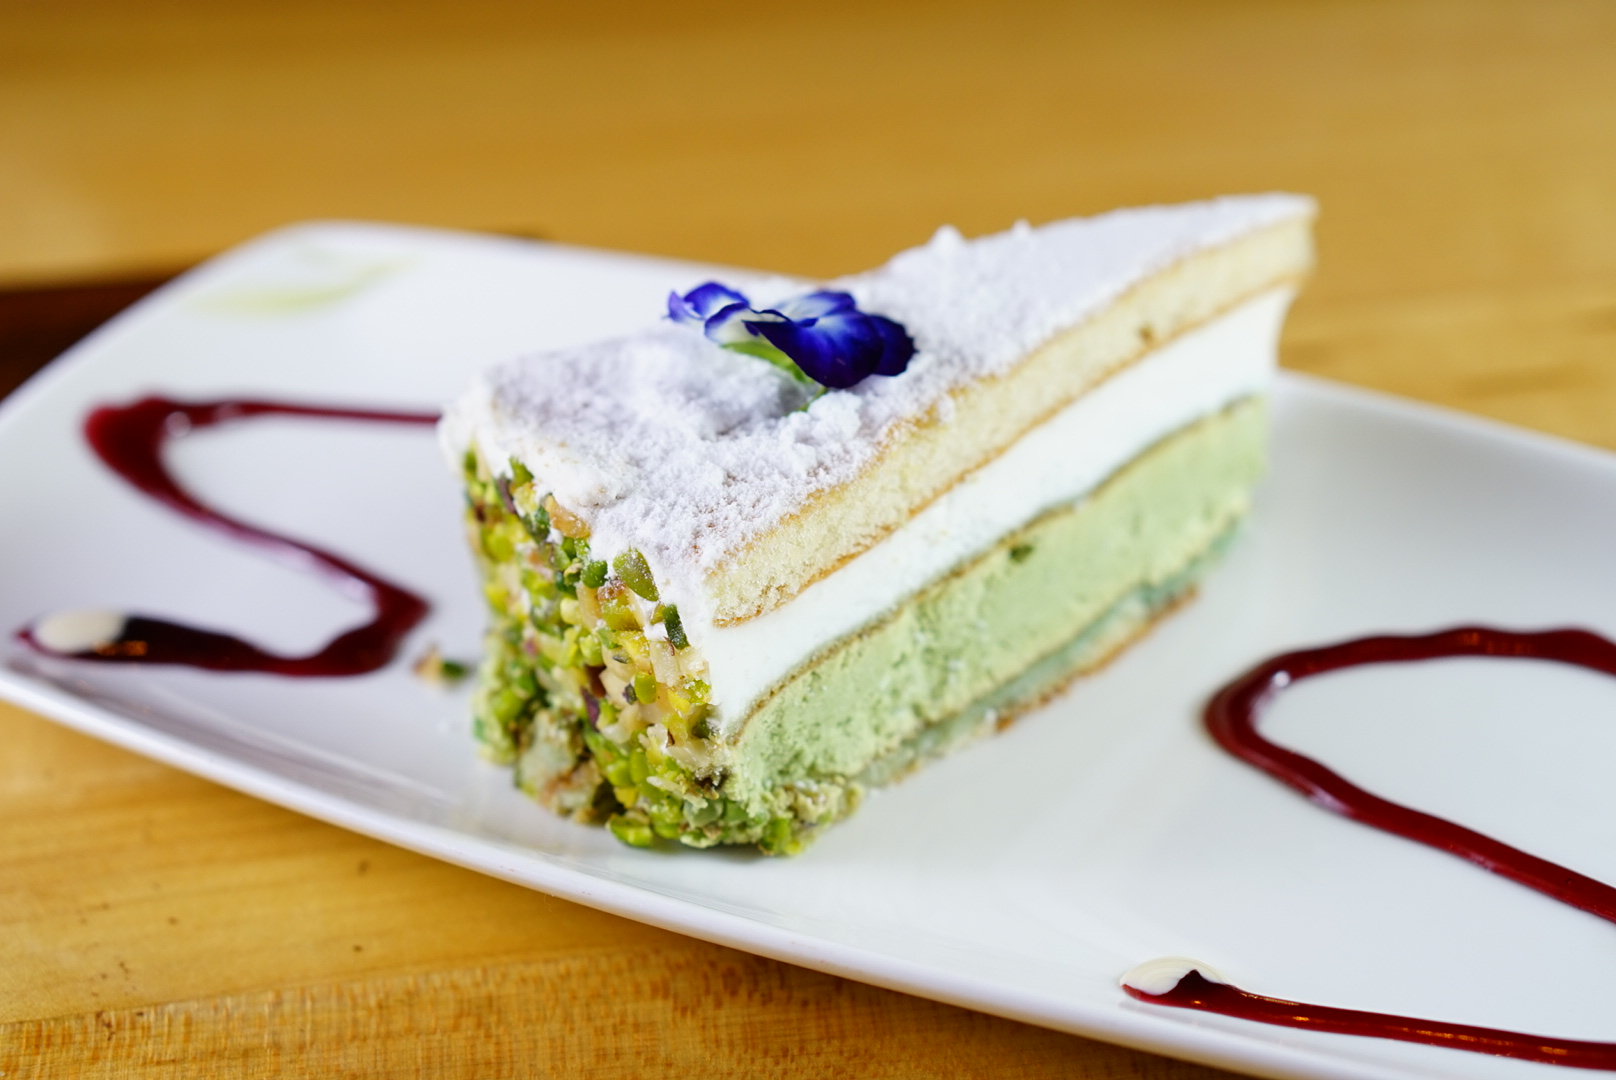 Ricotta & Pistachio Cake